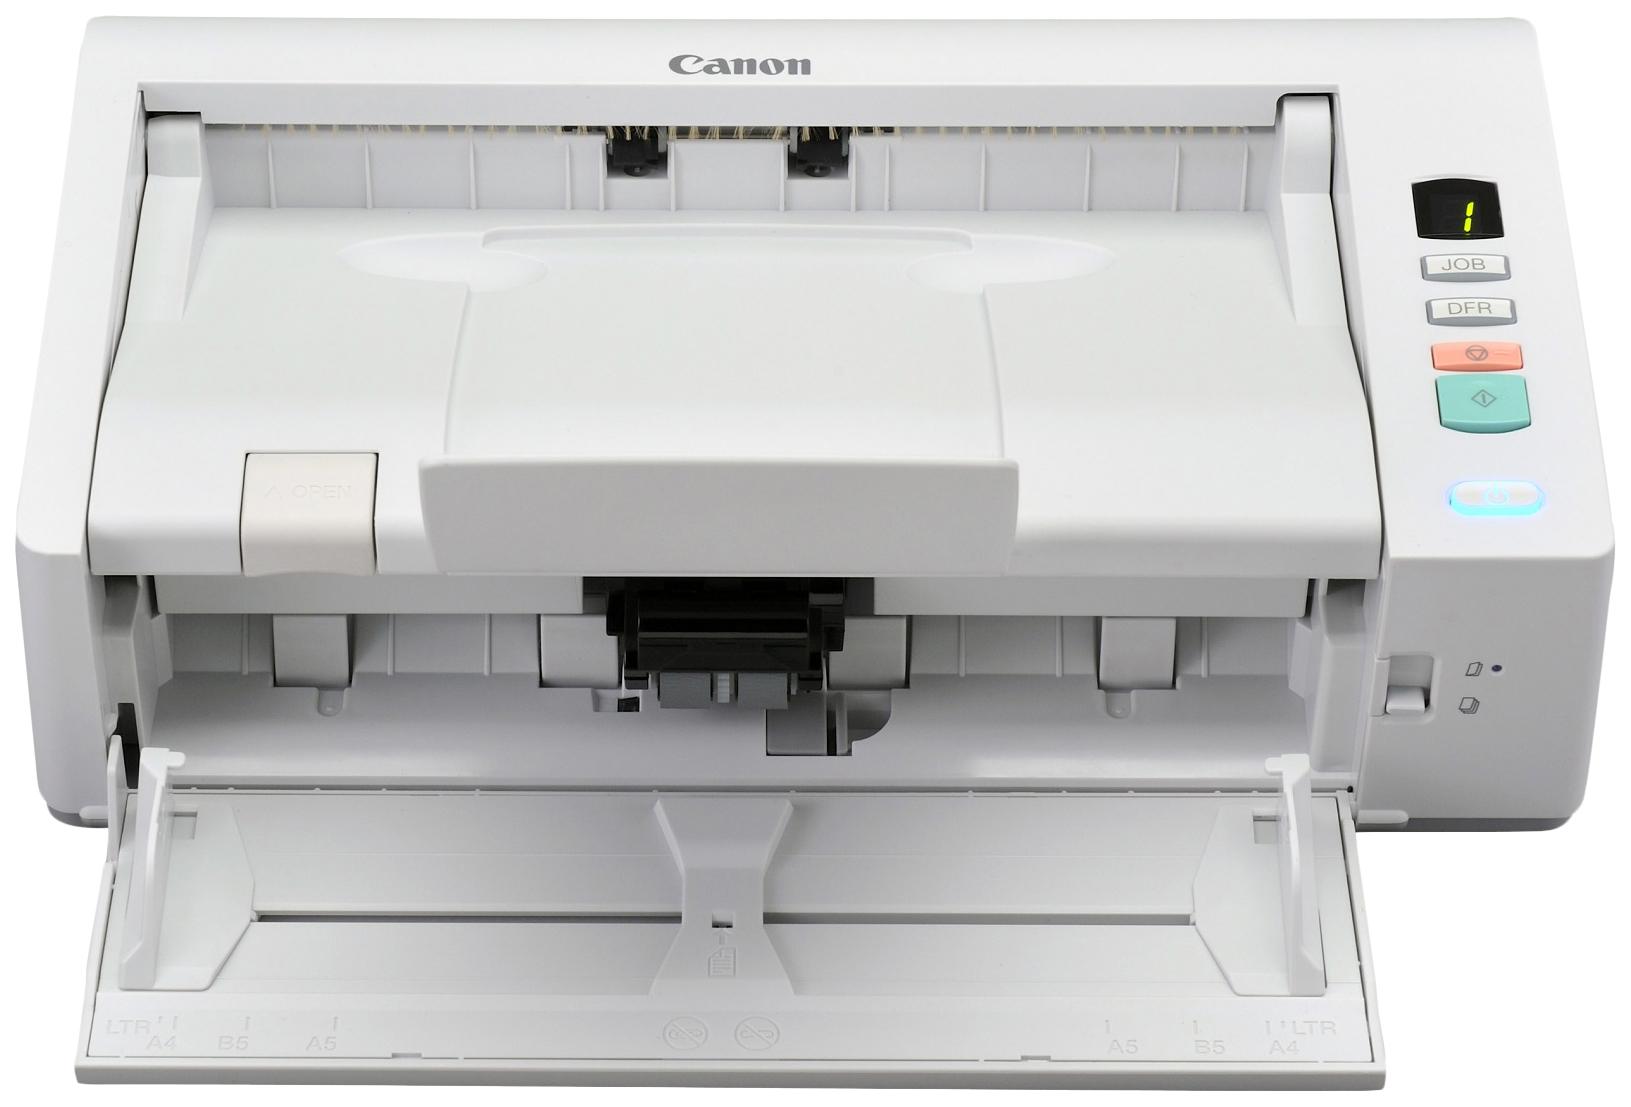 Сканер Canon ImageFORMULA DR M140 5482B003 Серый